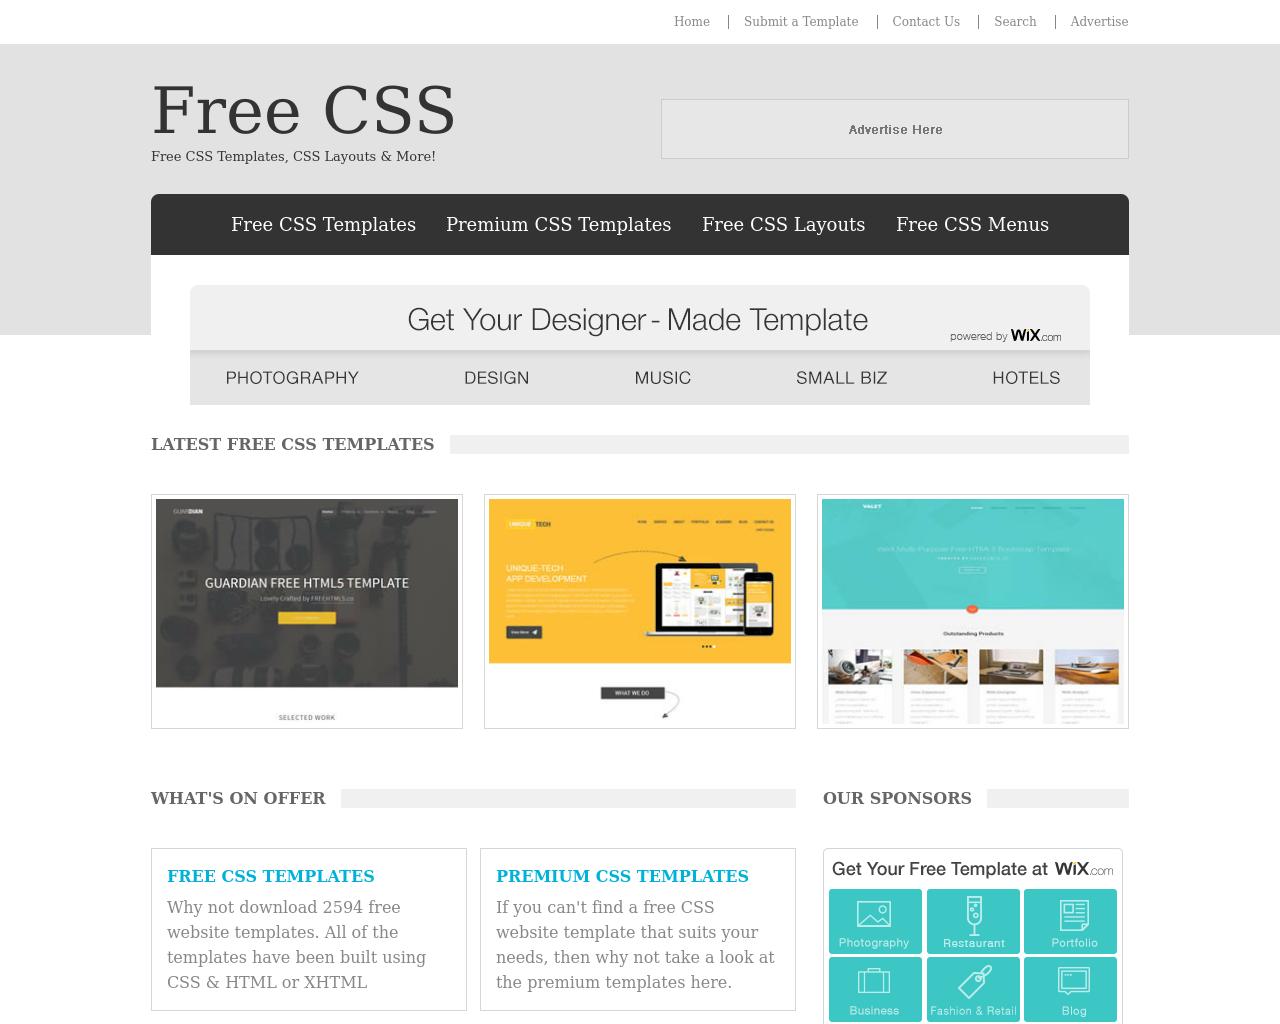 Free-CSS-Advertising-Reviews-Pricing